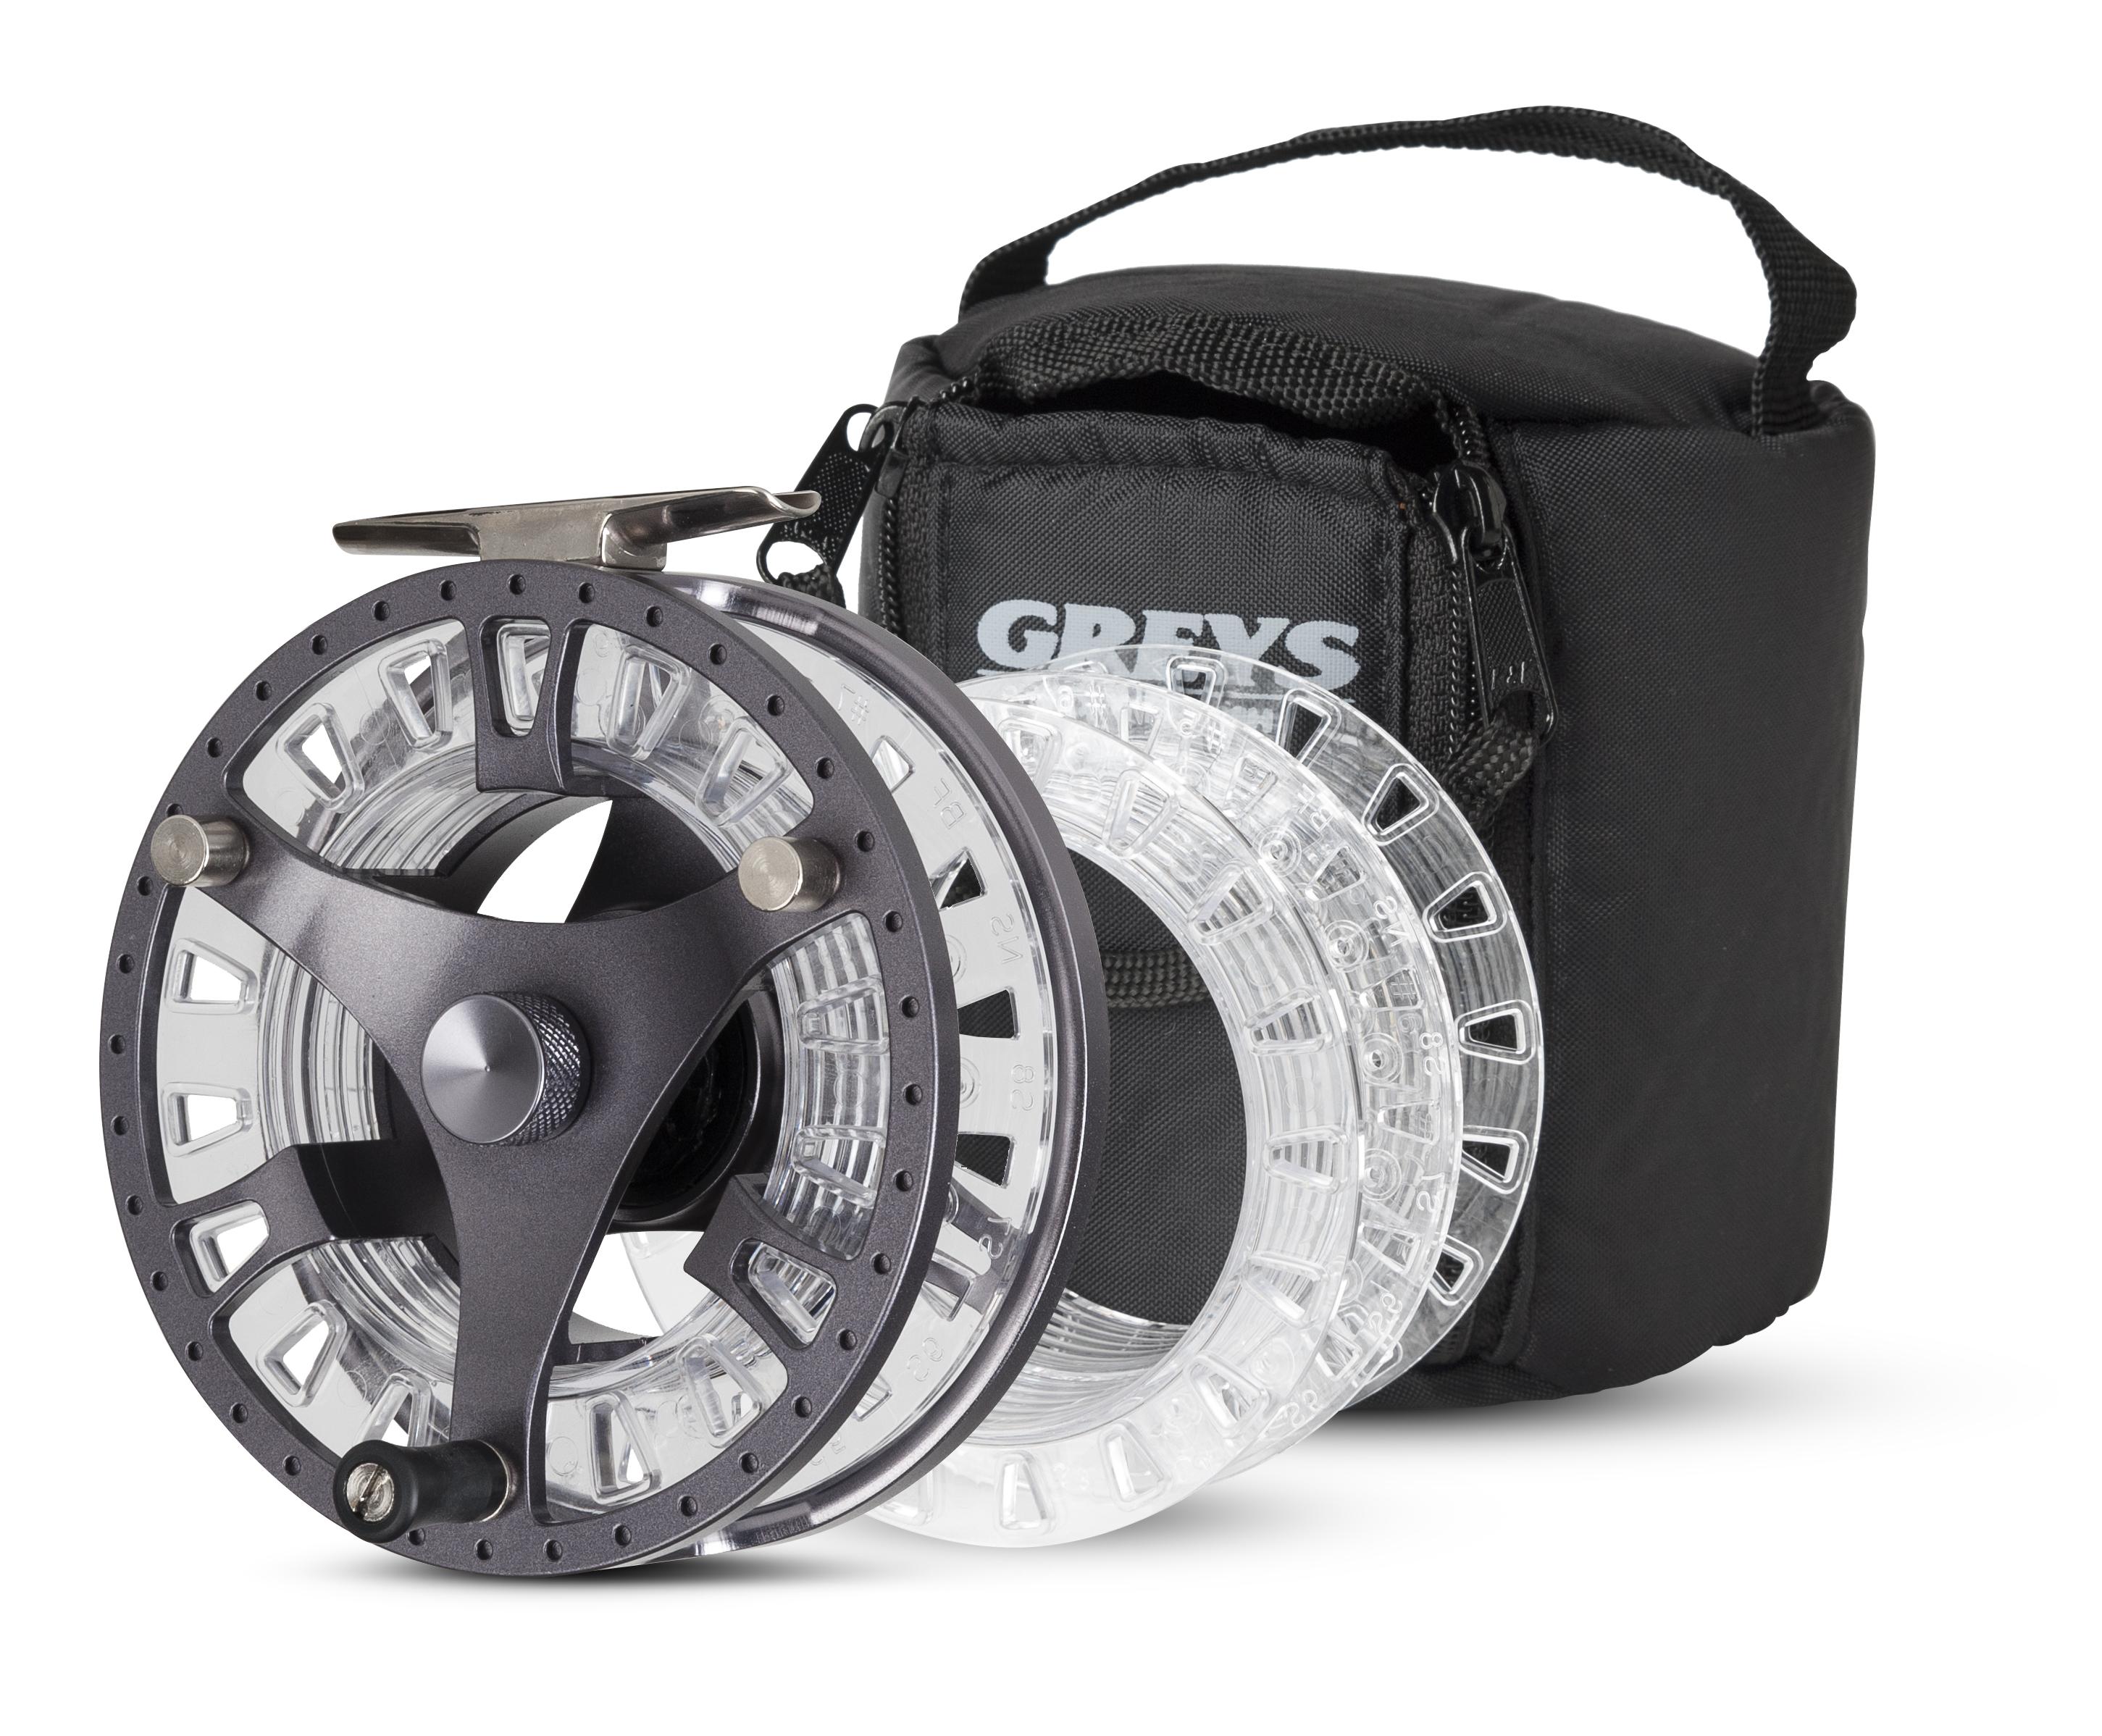 N/A – Greys gts700 fra fiskegrej.dk